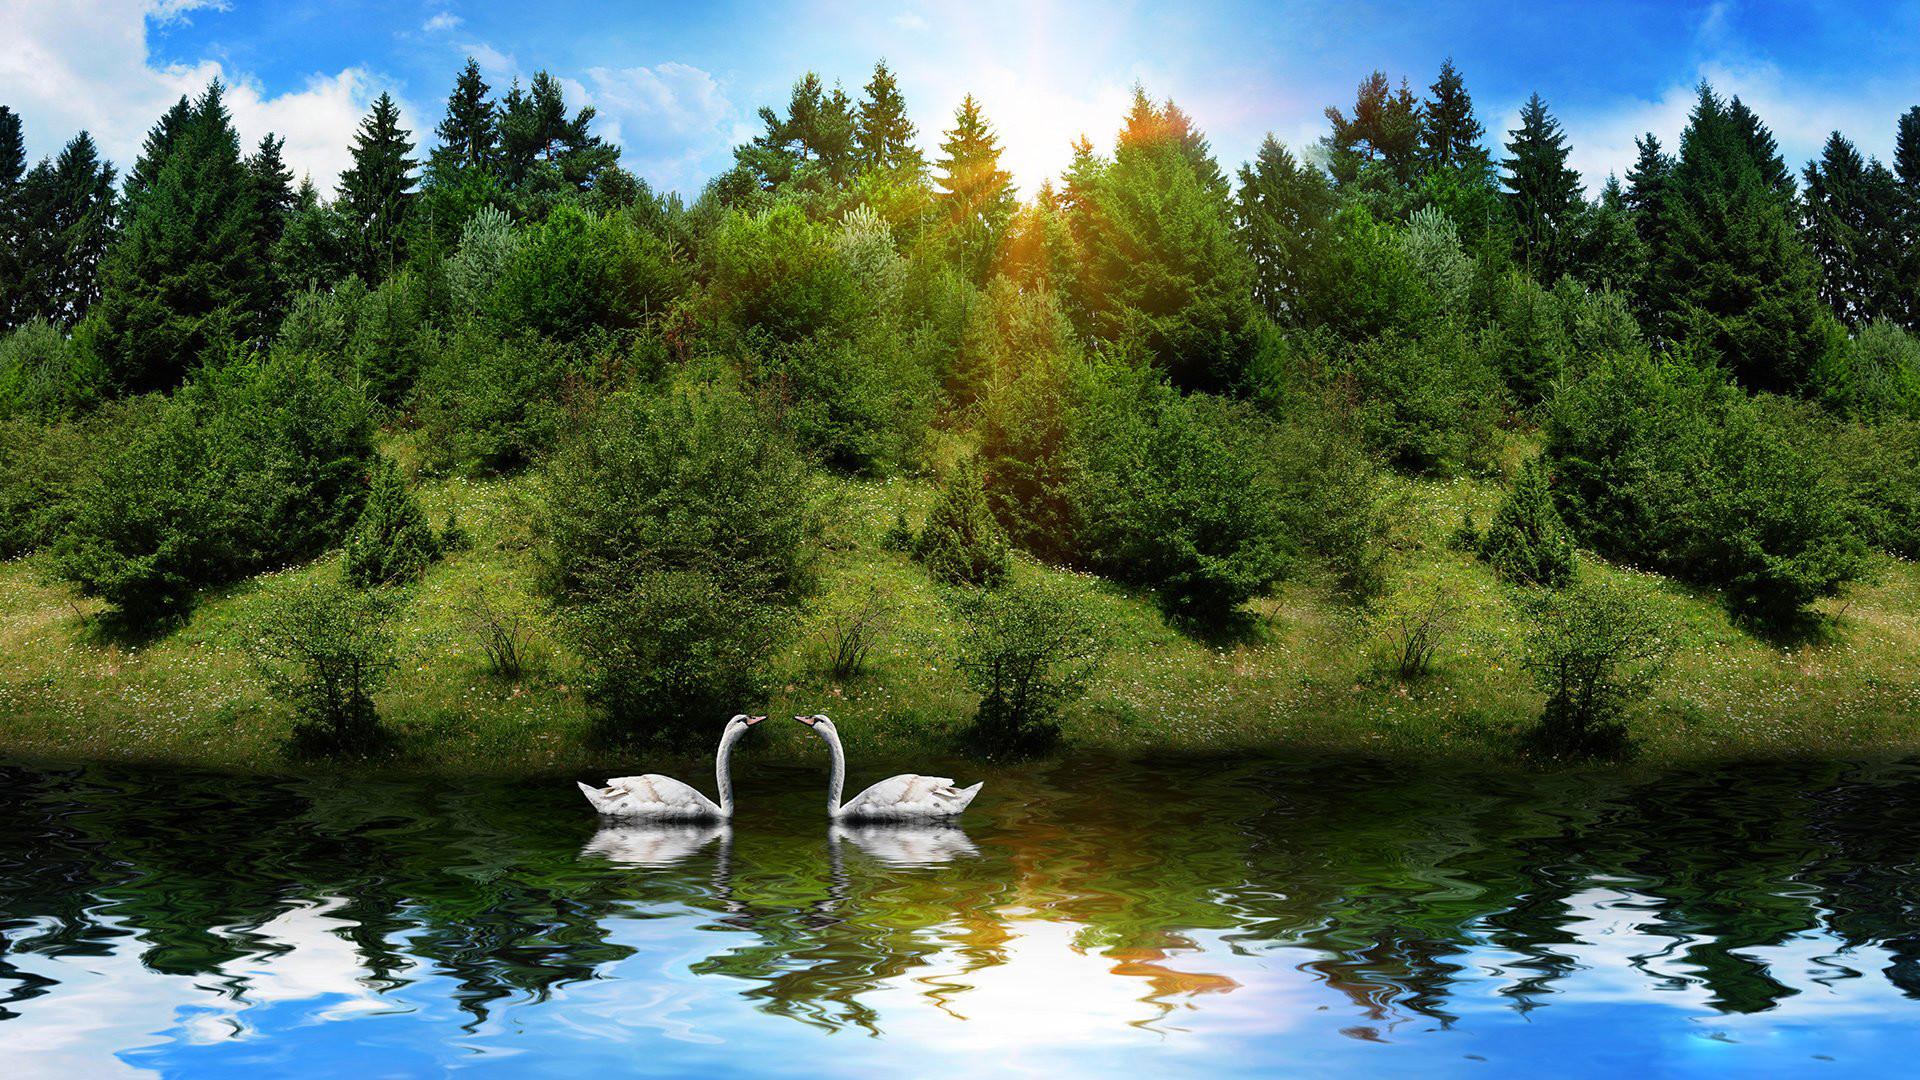 Beautiful Nature Photos HD download.